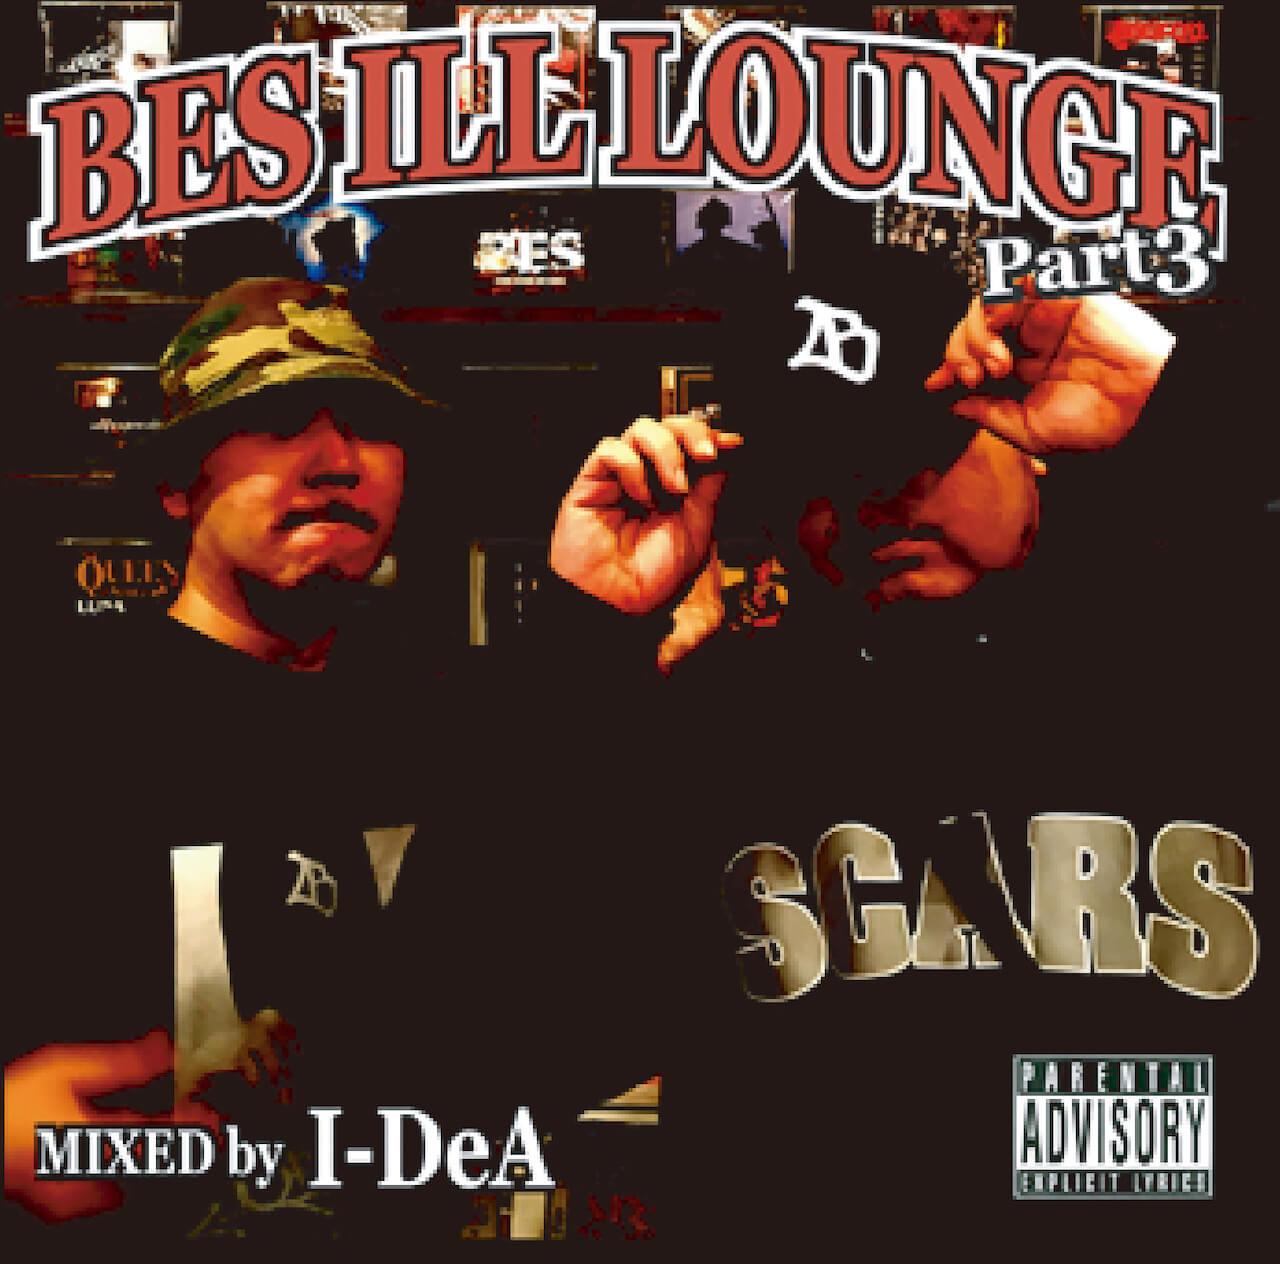 BESによる人気MIXシリーズ『BES ILL LOUNGE』最新版は盟友I-DeAとのジョイント!B.D.、BIM、MEGA-G、D.D.S&MULBEらとの各コラボ曲を収録 music201106-bes-ill-lounge-mix-2